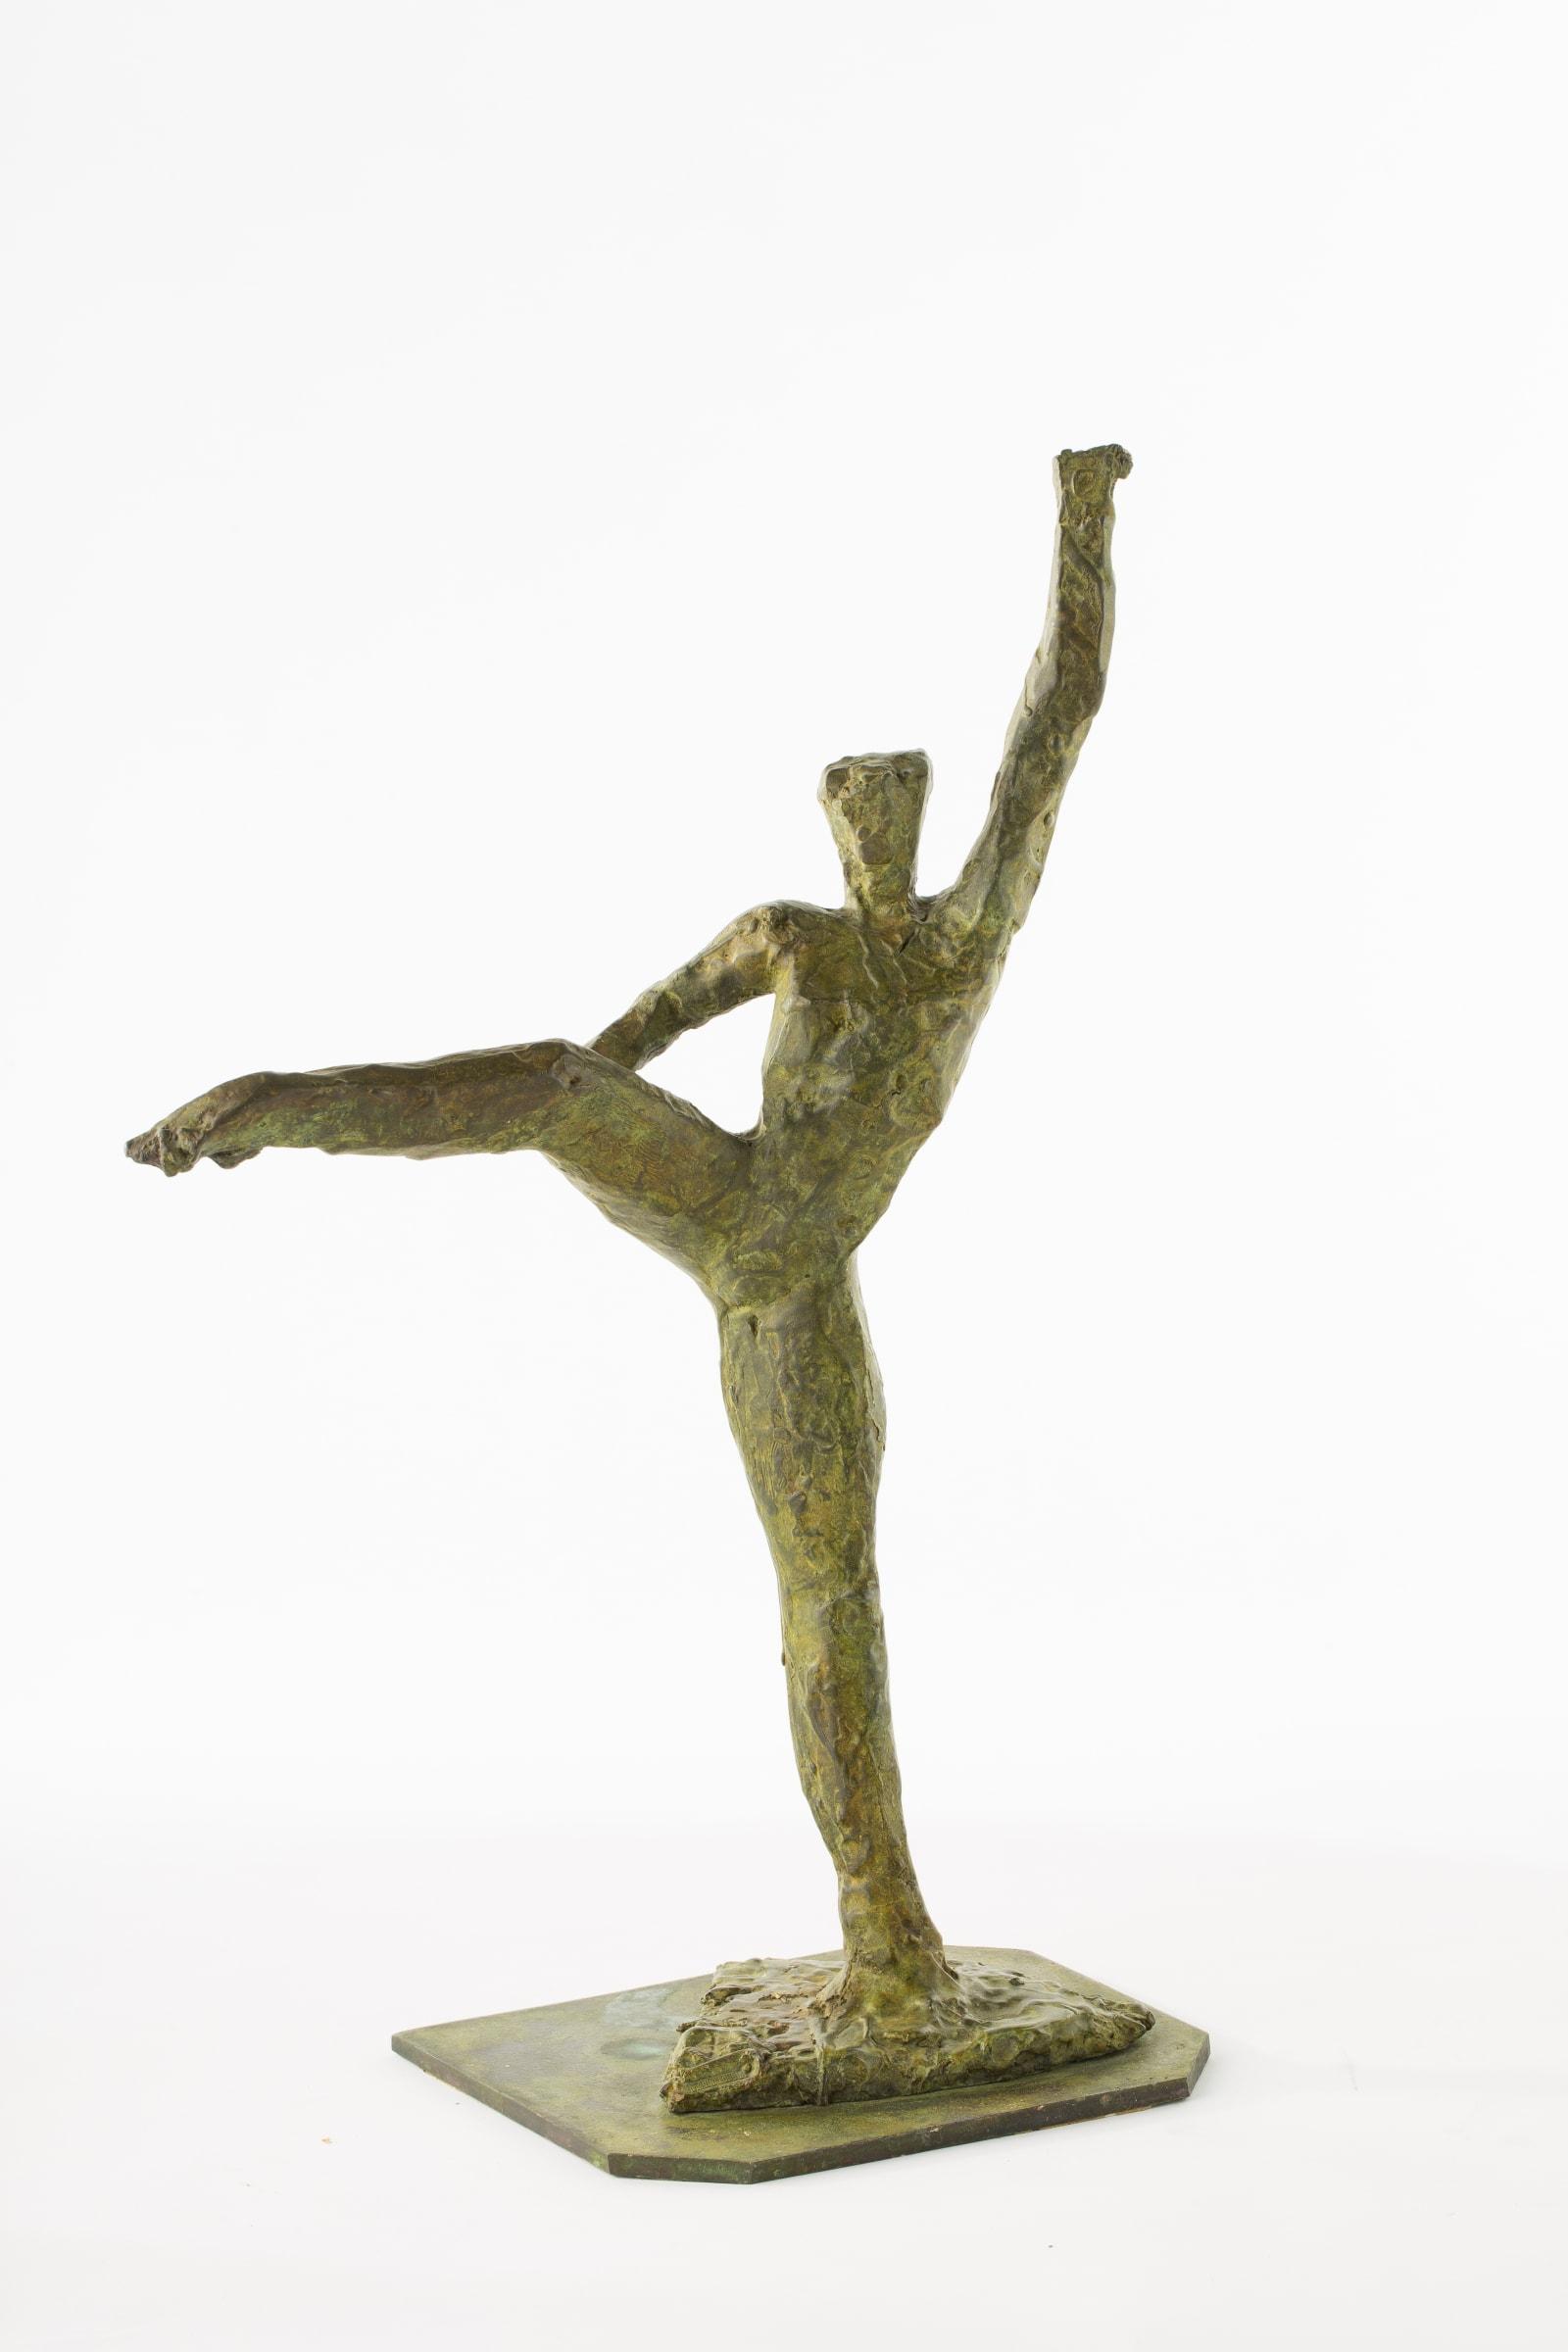 "<span class=""link fancybox-details-link""><a href=""/artists/78-ivor-abrahams/works/9822-ivor-abrahams-dancer-1987/"">View Detail Page</a></span><div class=""artist""><span class=""artist""><strong>IVOR ABRAHAMS</strong></span></div><div class=""title""><em>Dancer</em>, 1987</div><div class=""medium"">Bronze</div><div class=""dimensions"">46.5 x 30 x 17 cm<br /> 18 1/4 x 11 x 3/4 x 6 3/4 inches</div><div class=""price"">£5,000.00</div>"